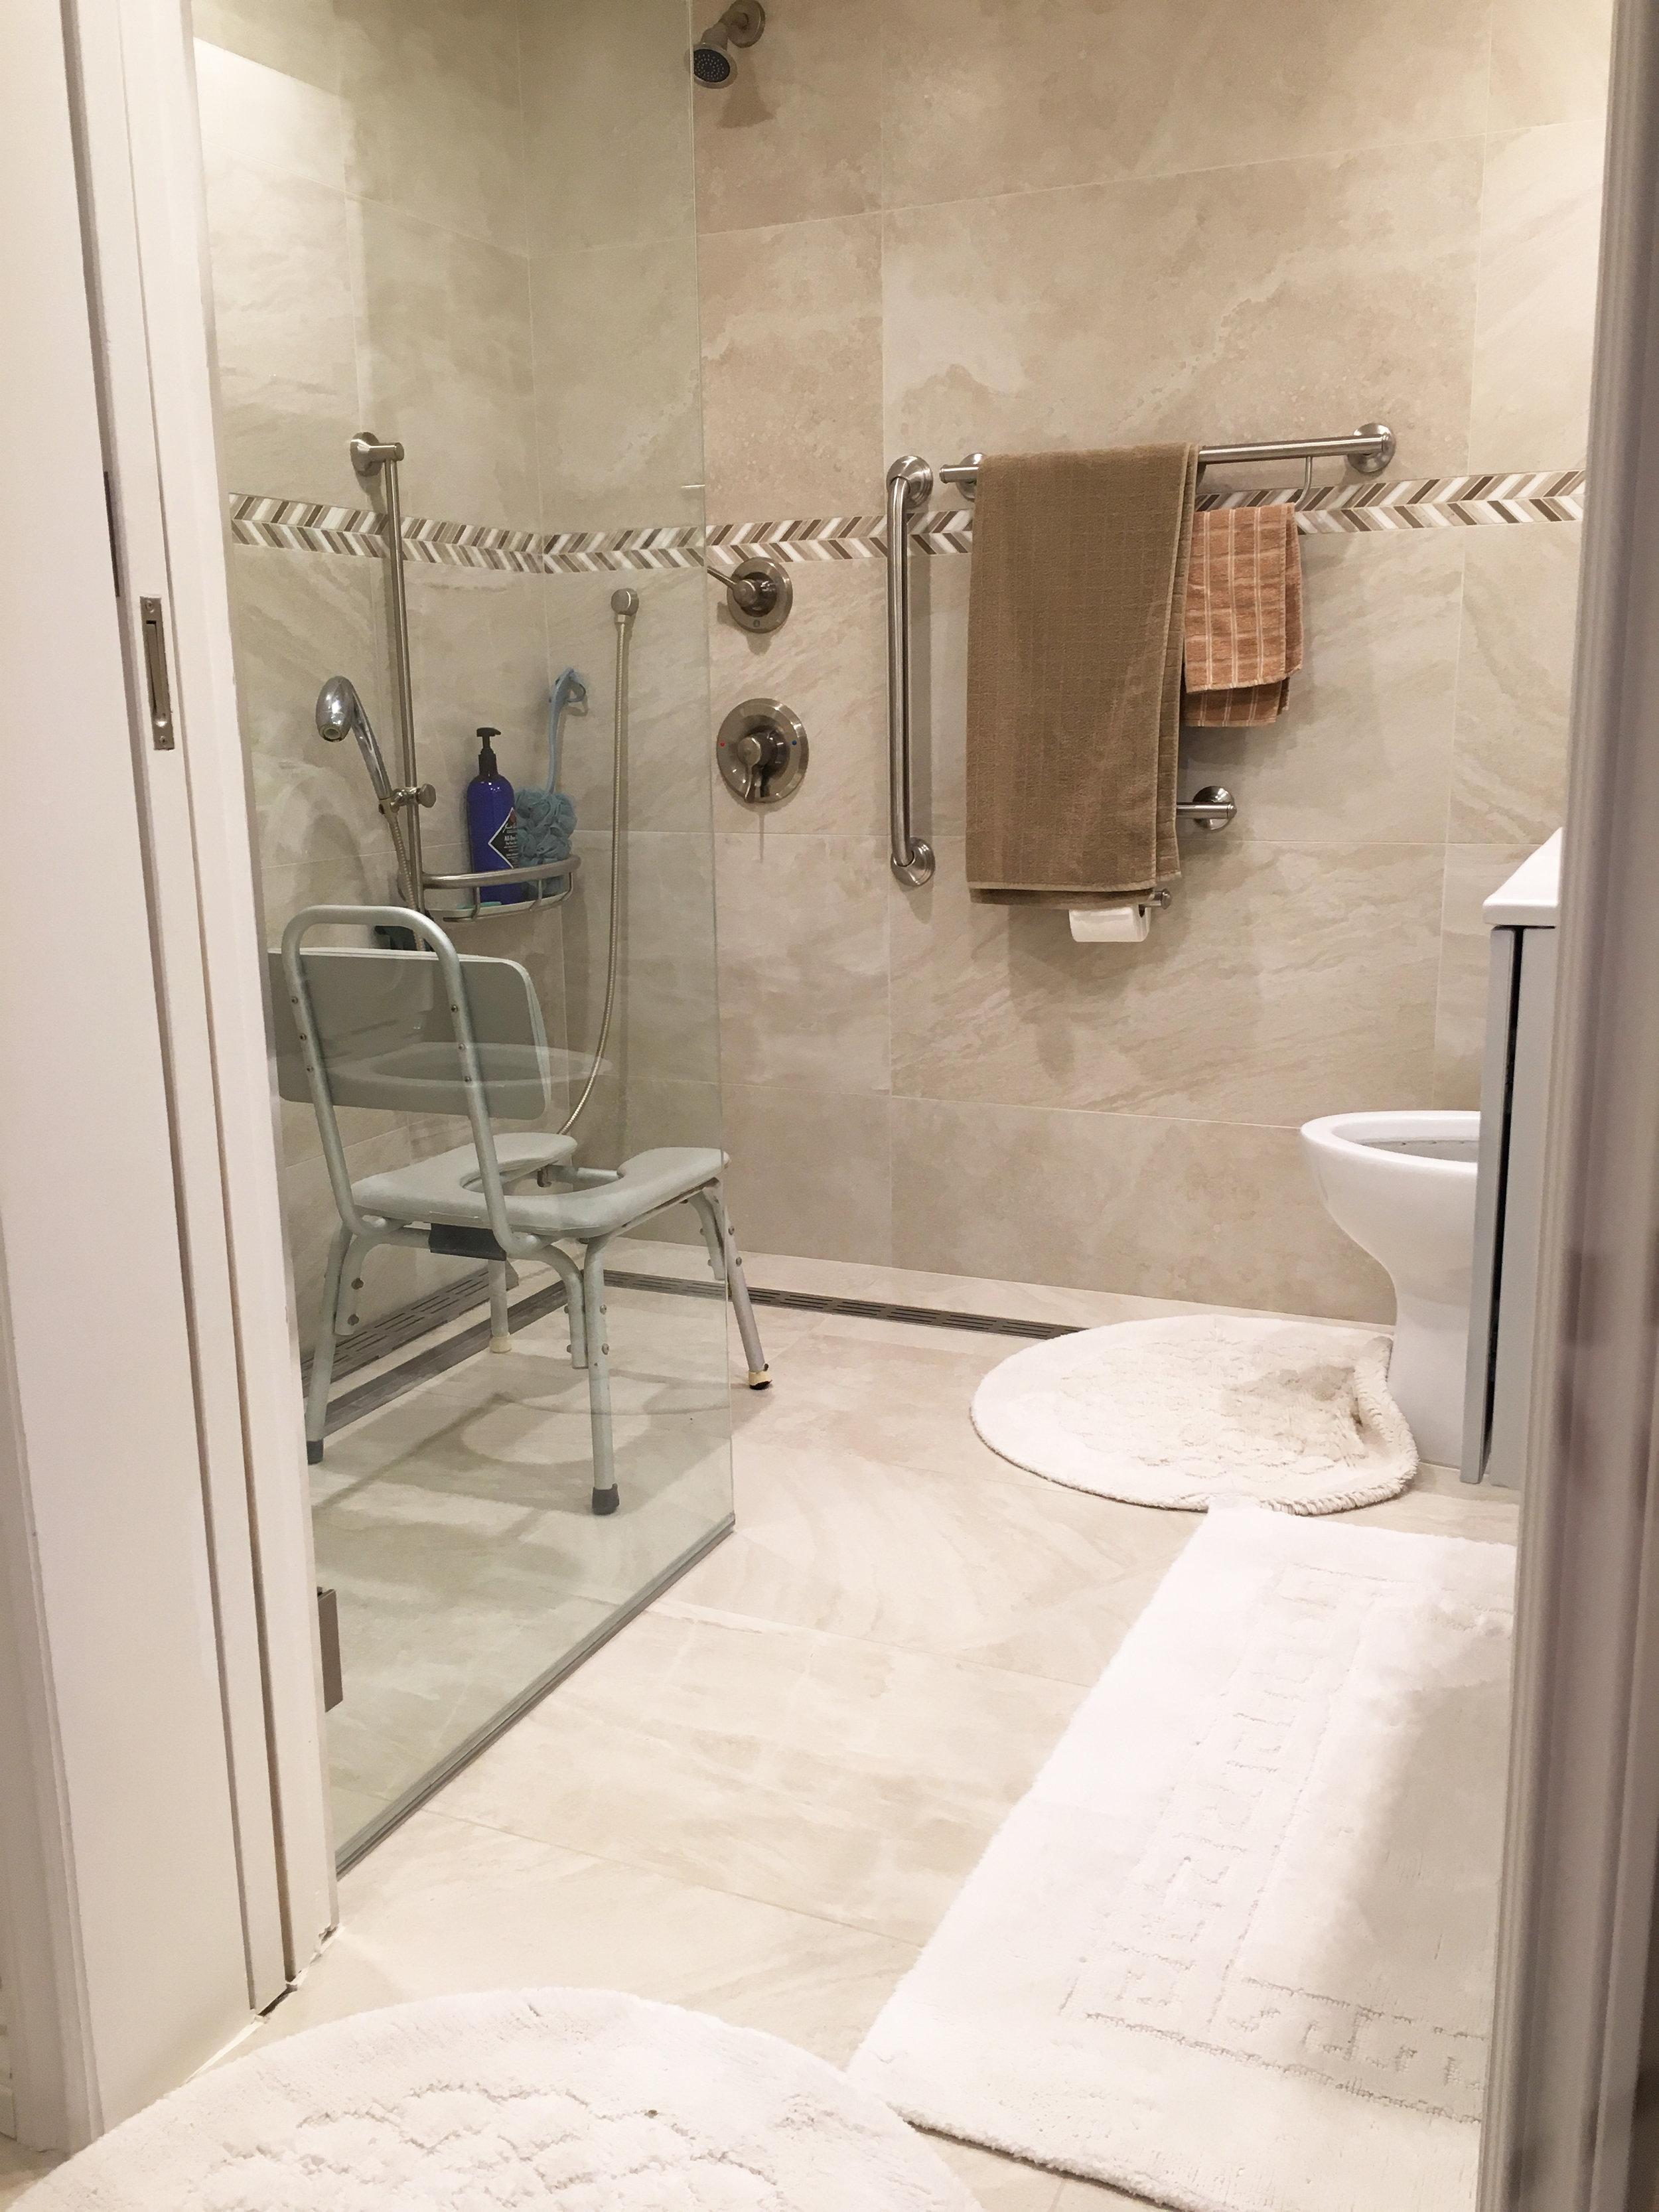 Town House bathroom remodel